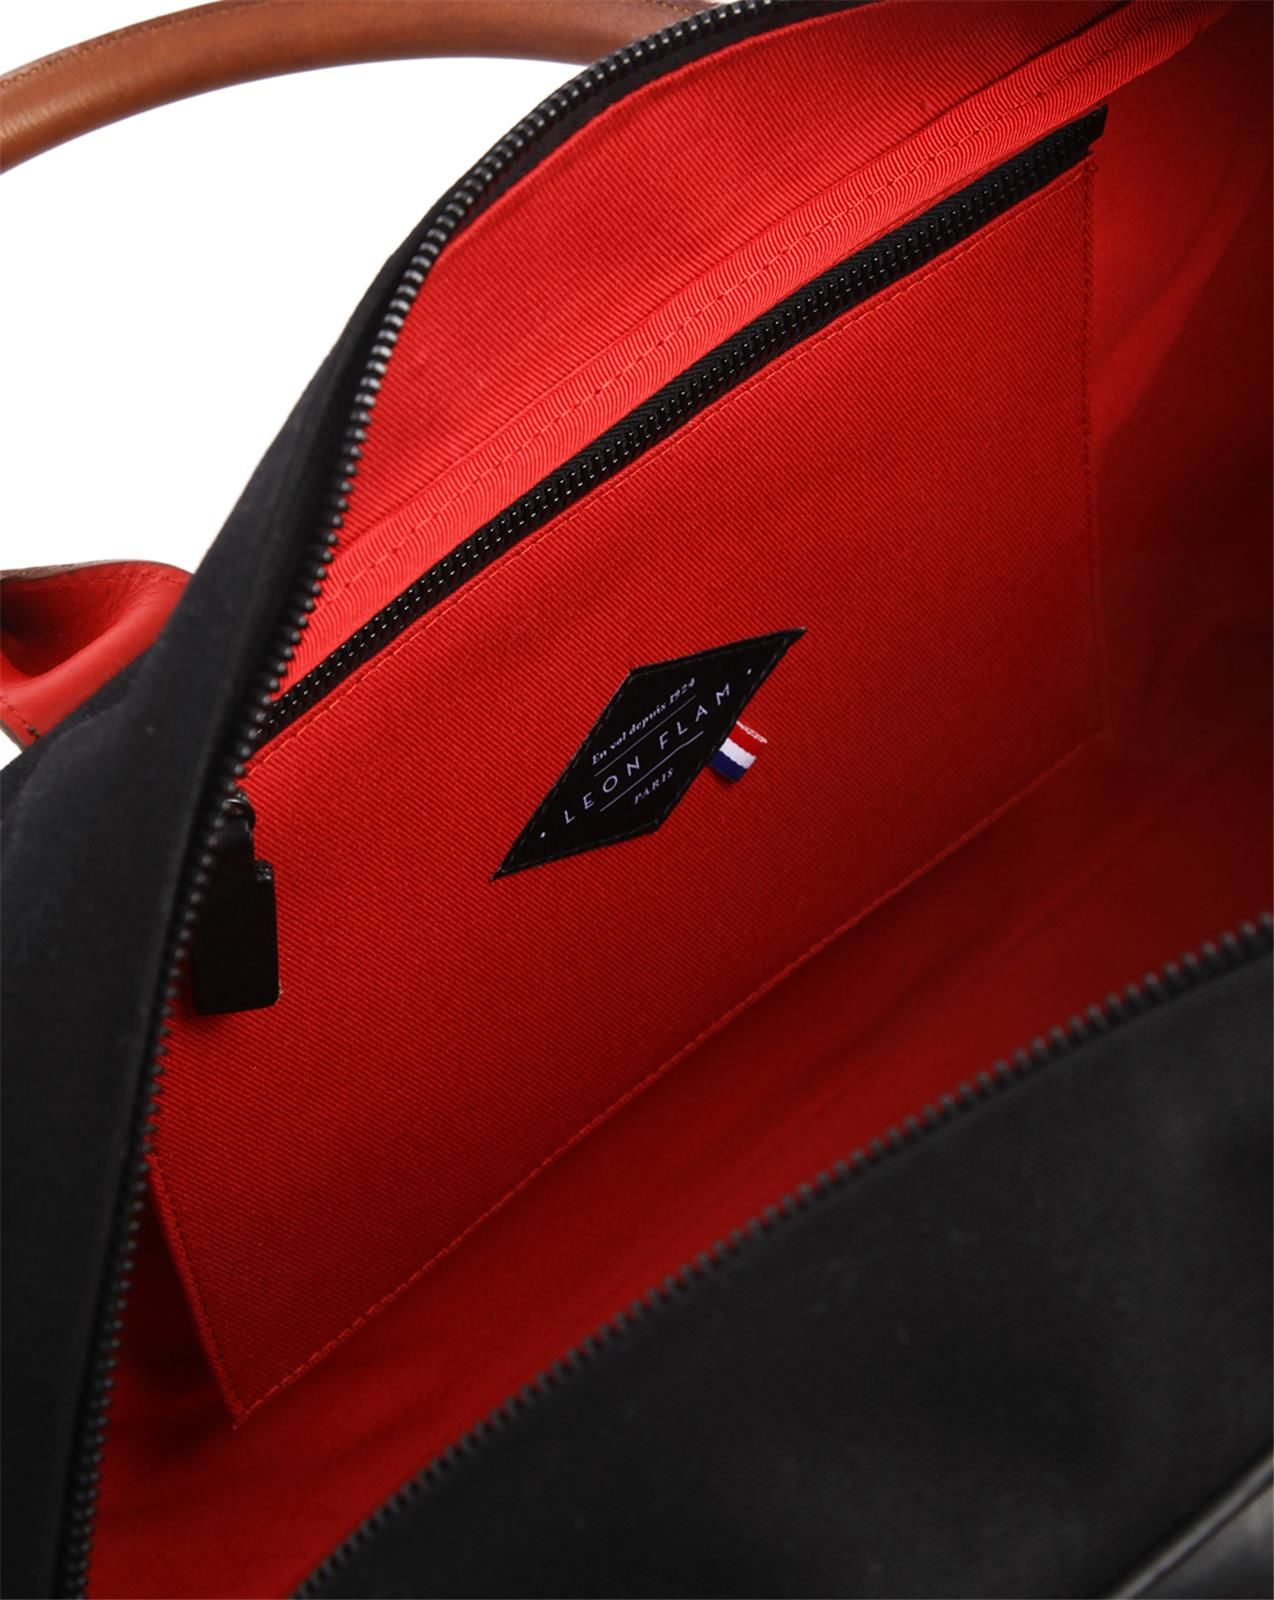 Leon flam 48H Bag Black, Leather And Croix Du Sud Canvas in Black ...